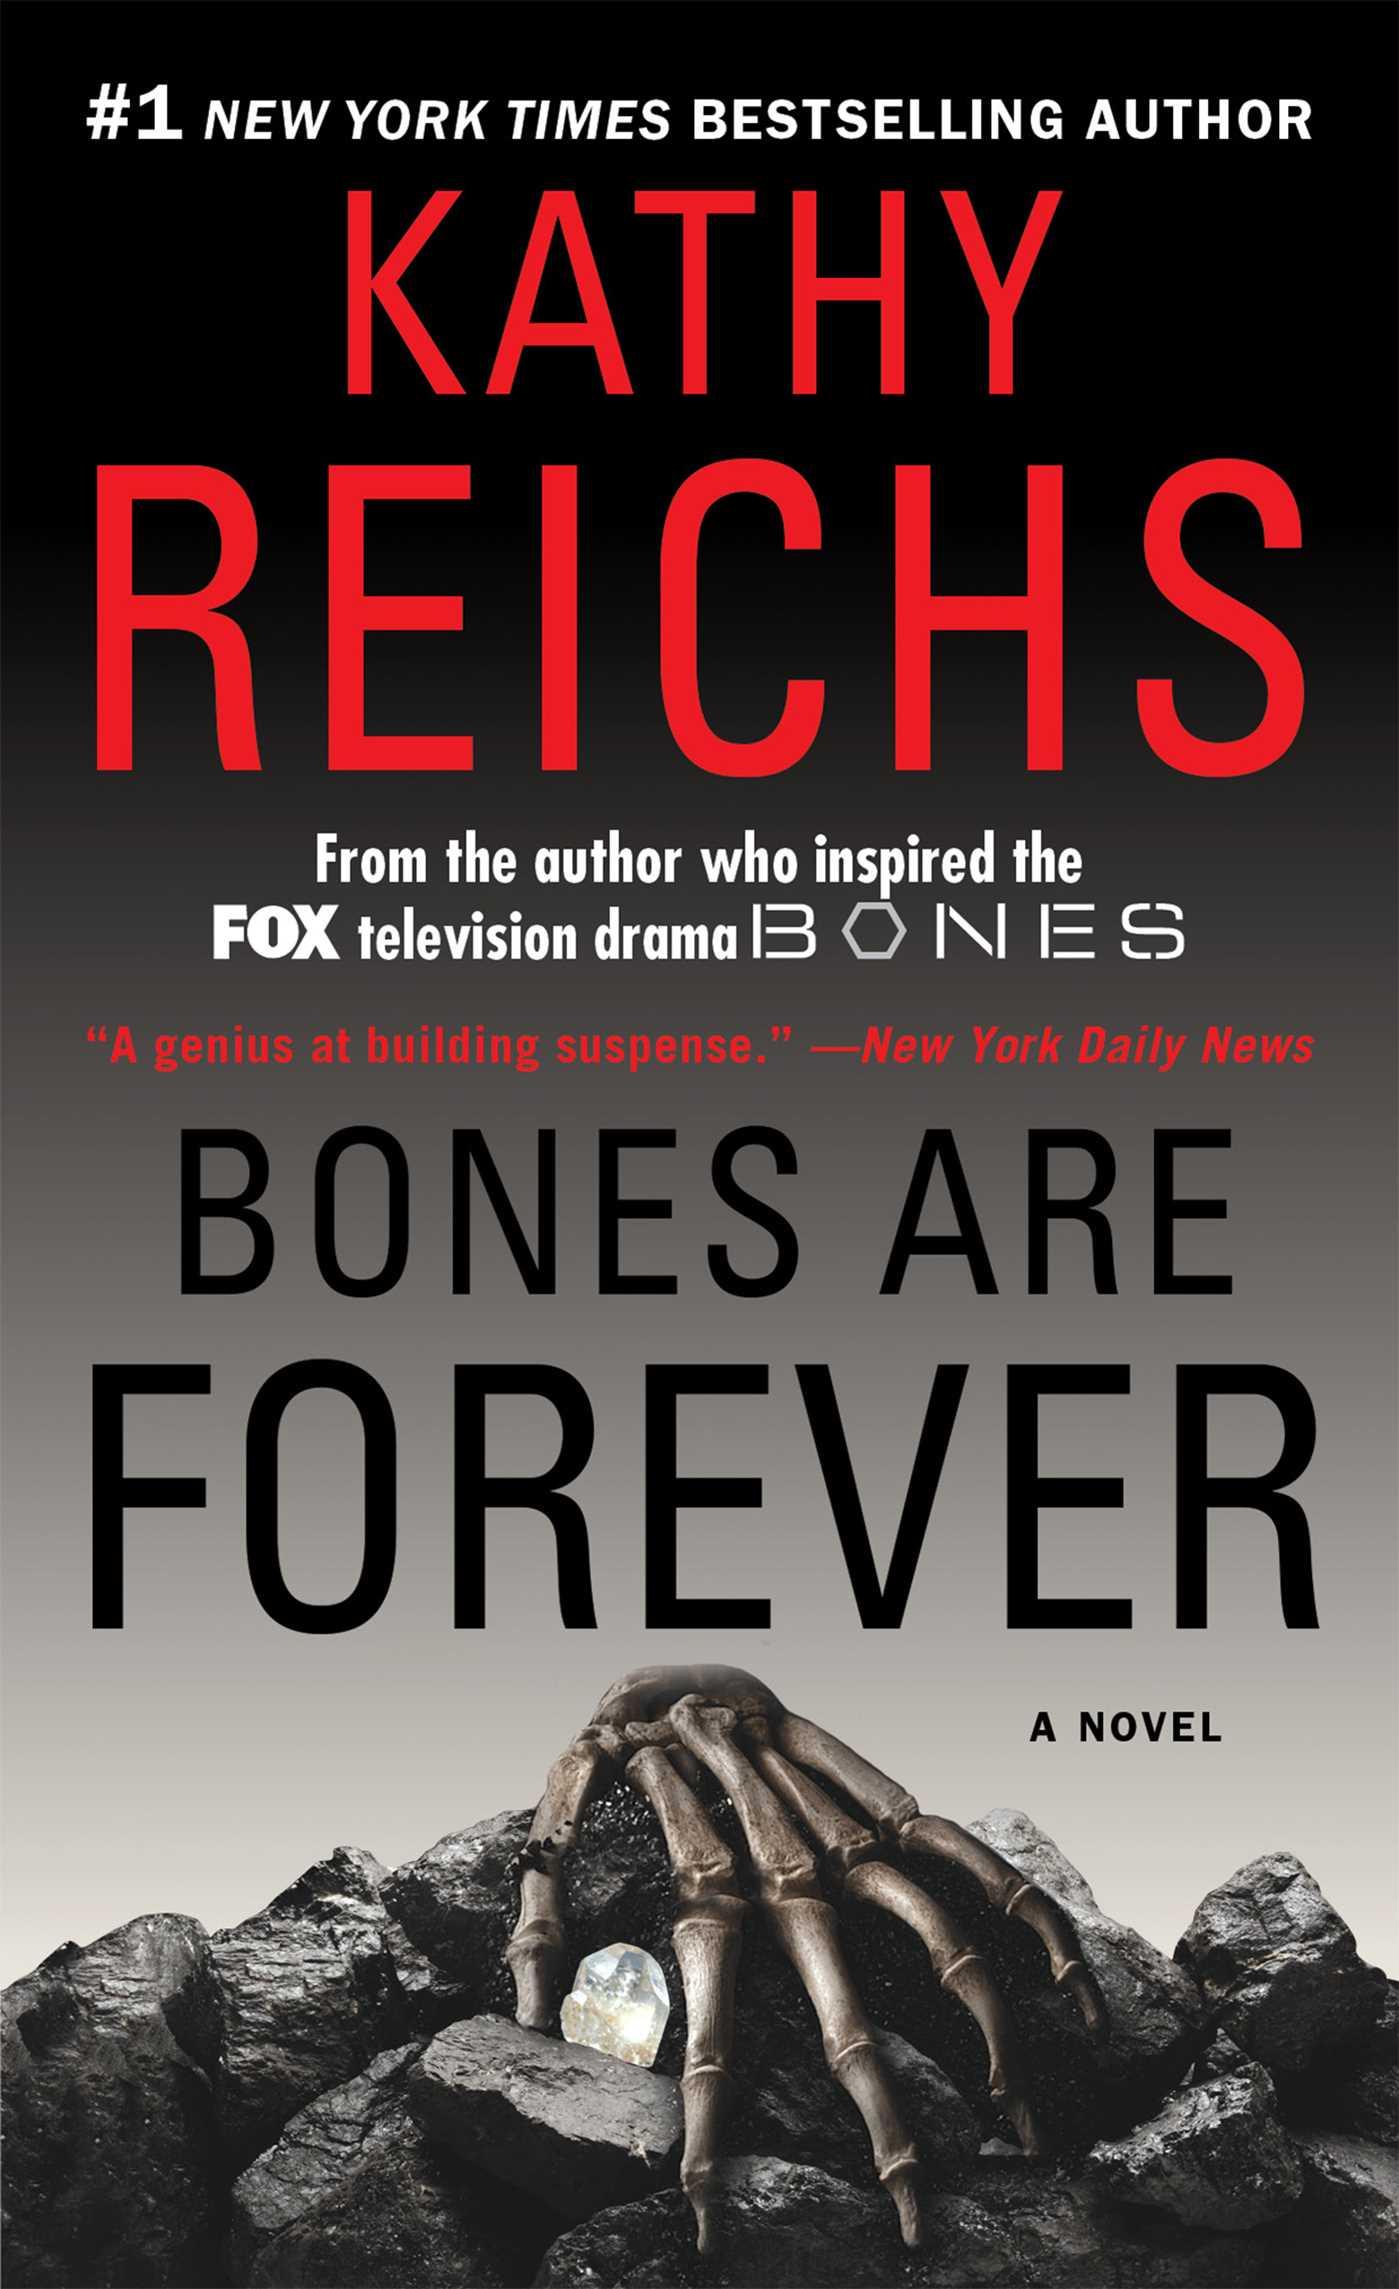 Bones are forever 9781439102442 hr